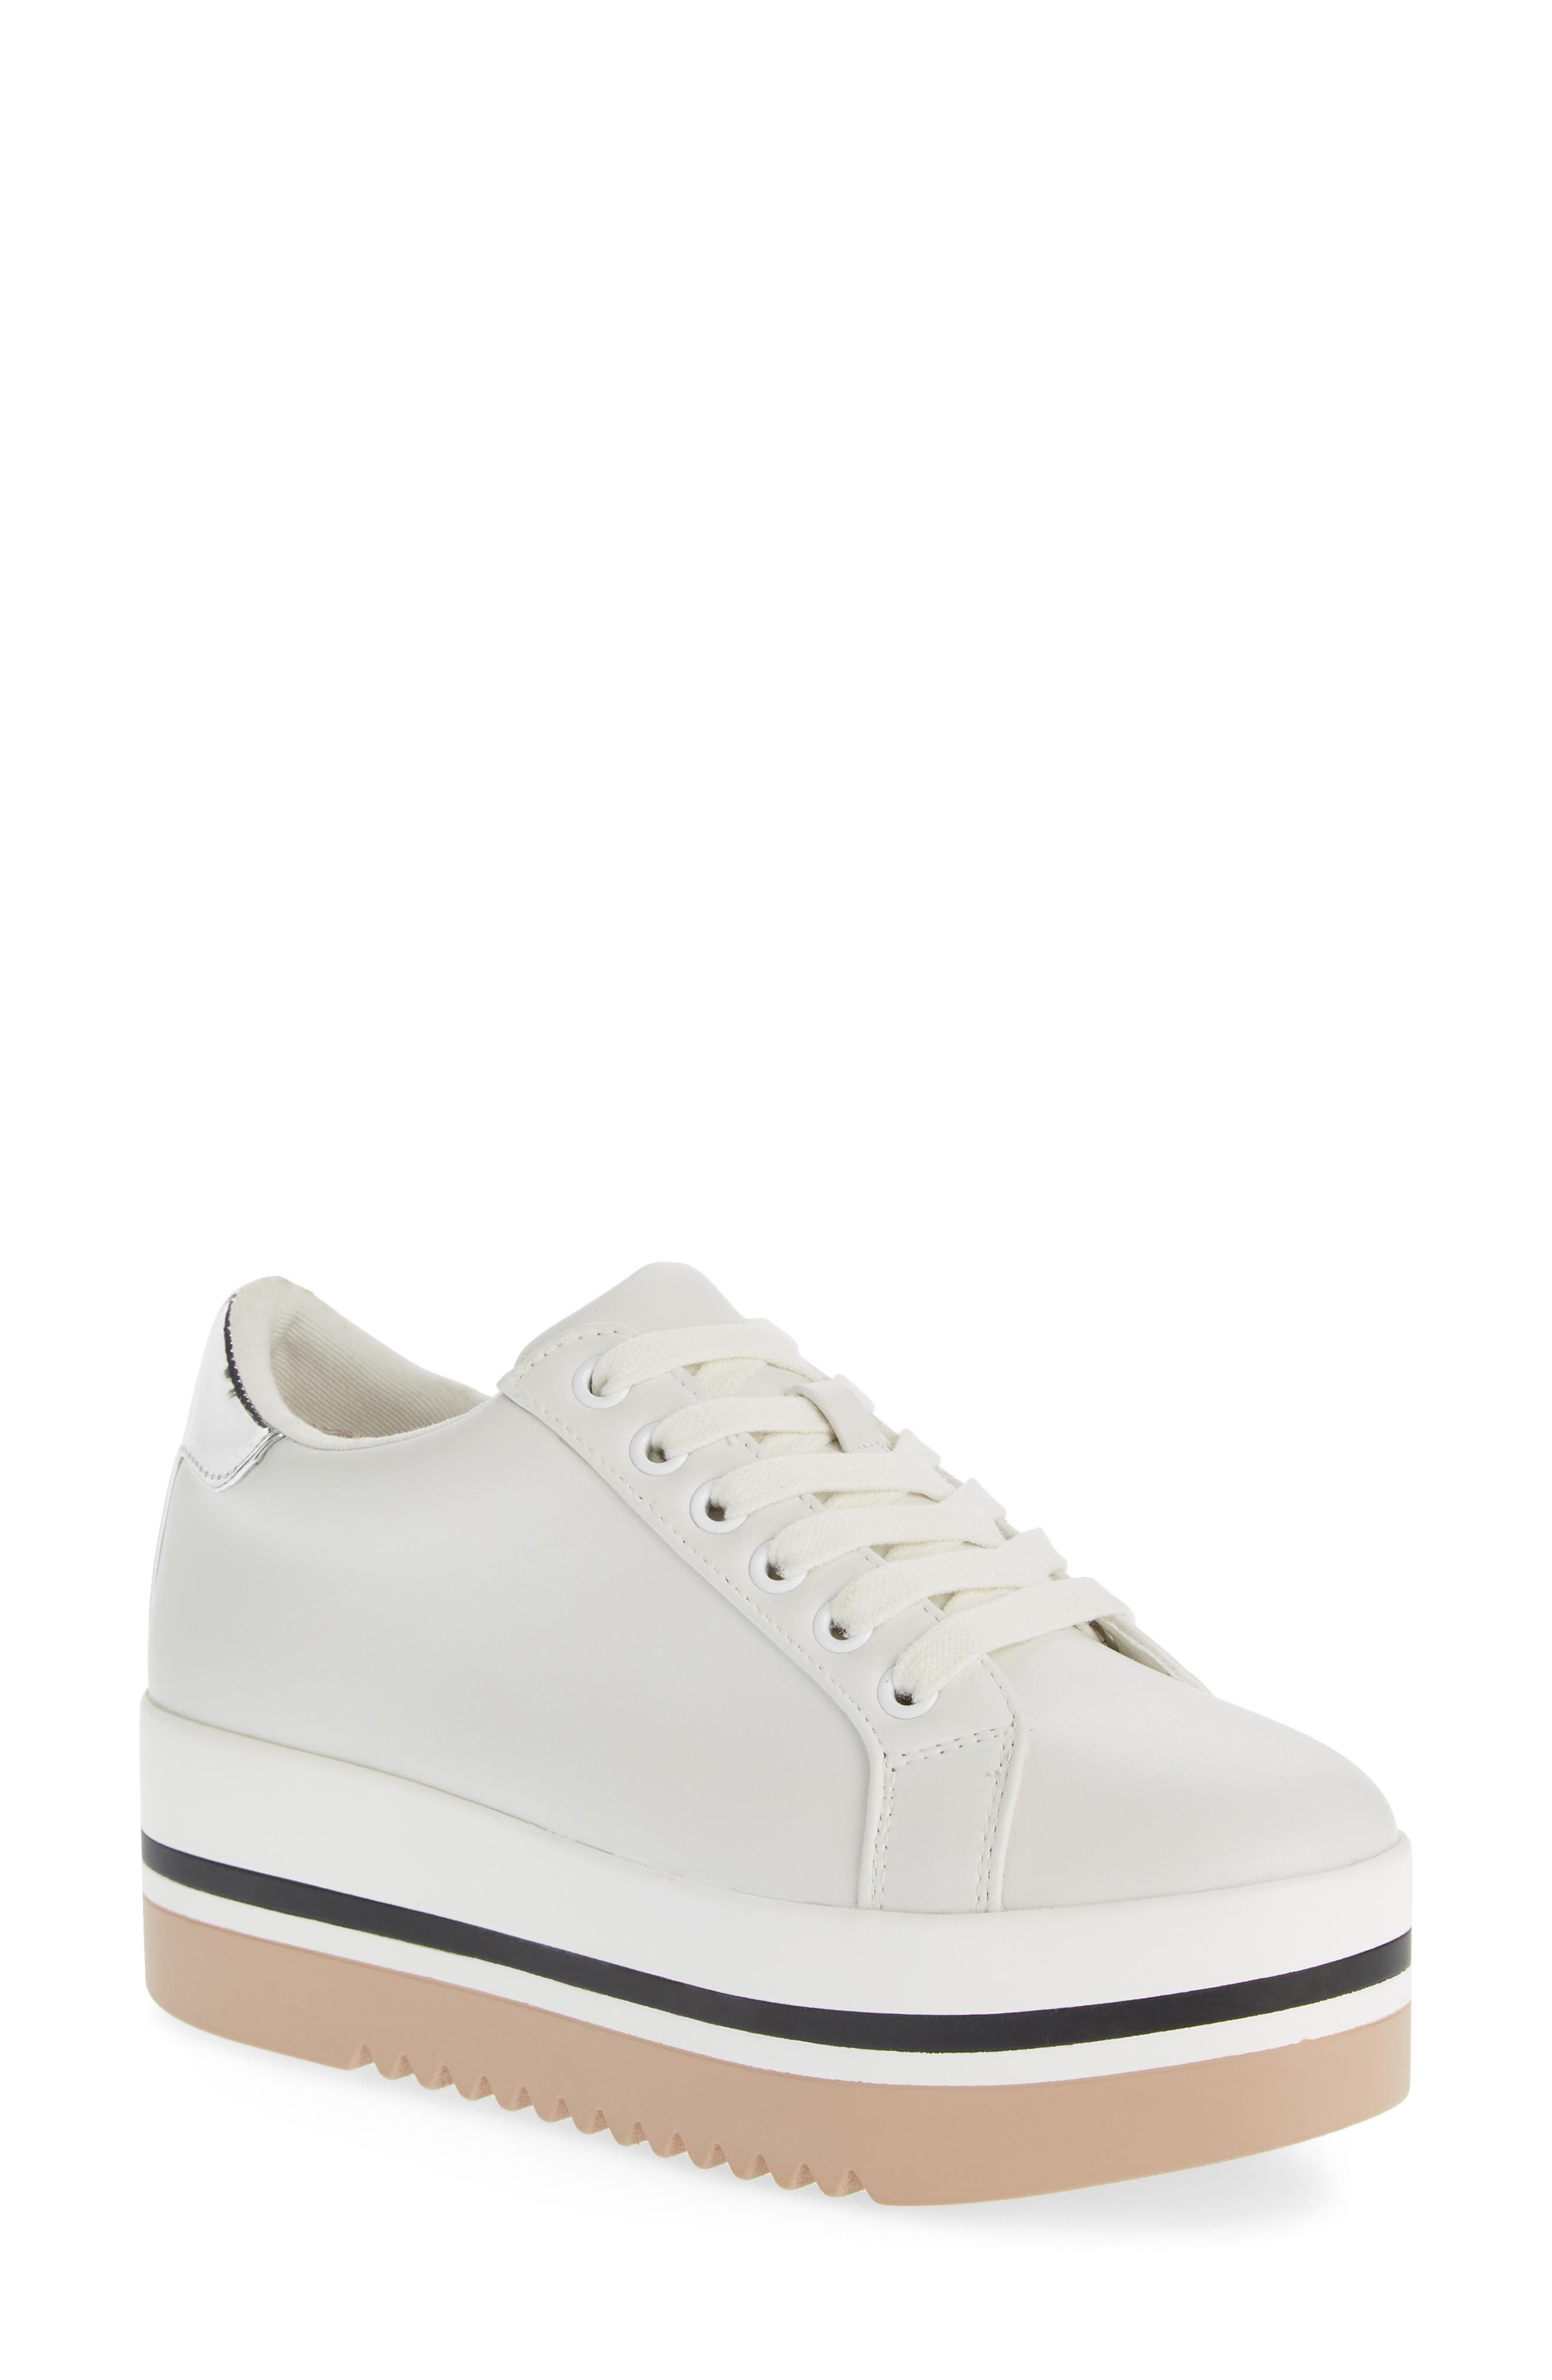 Alley Platform Sneaker,                             Main thumbnail 1, color,                             WHITE